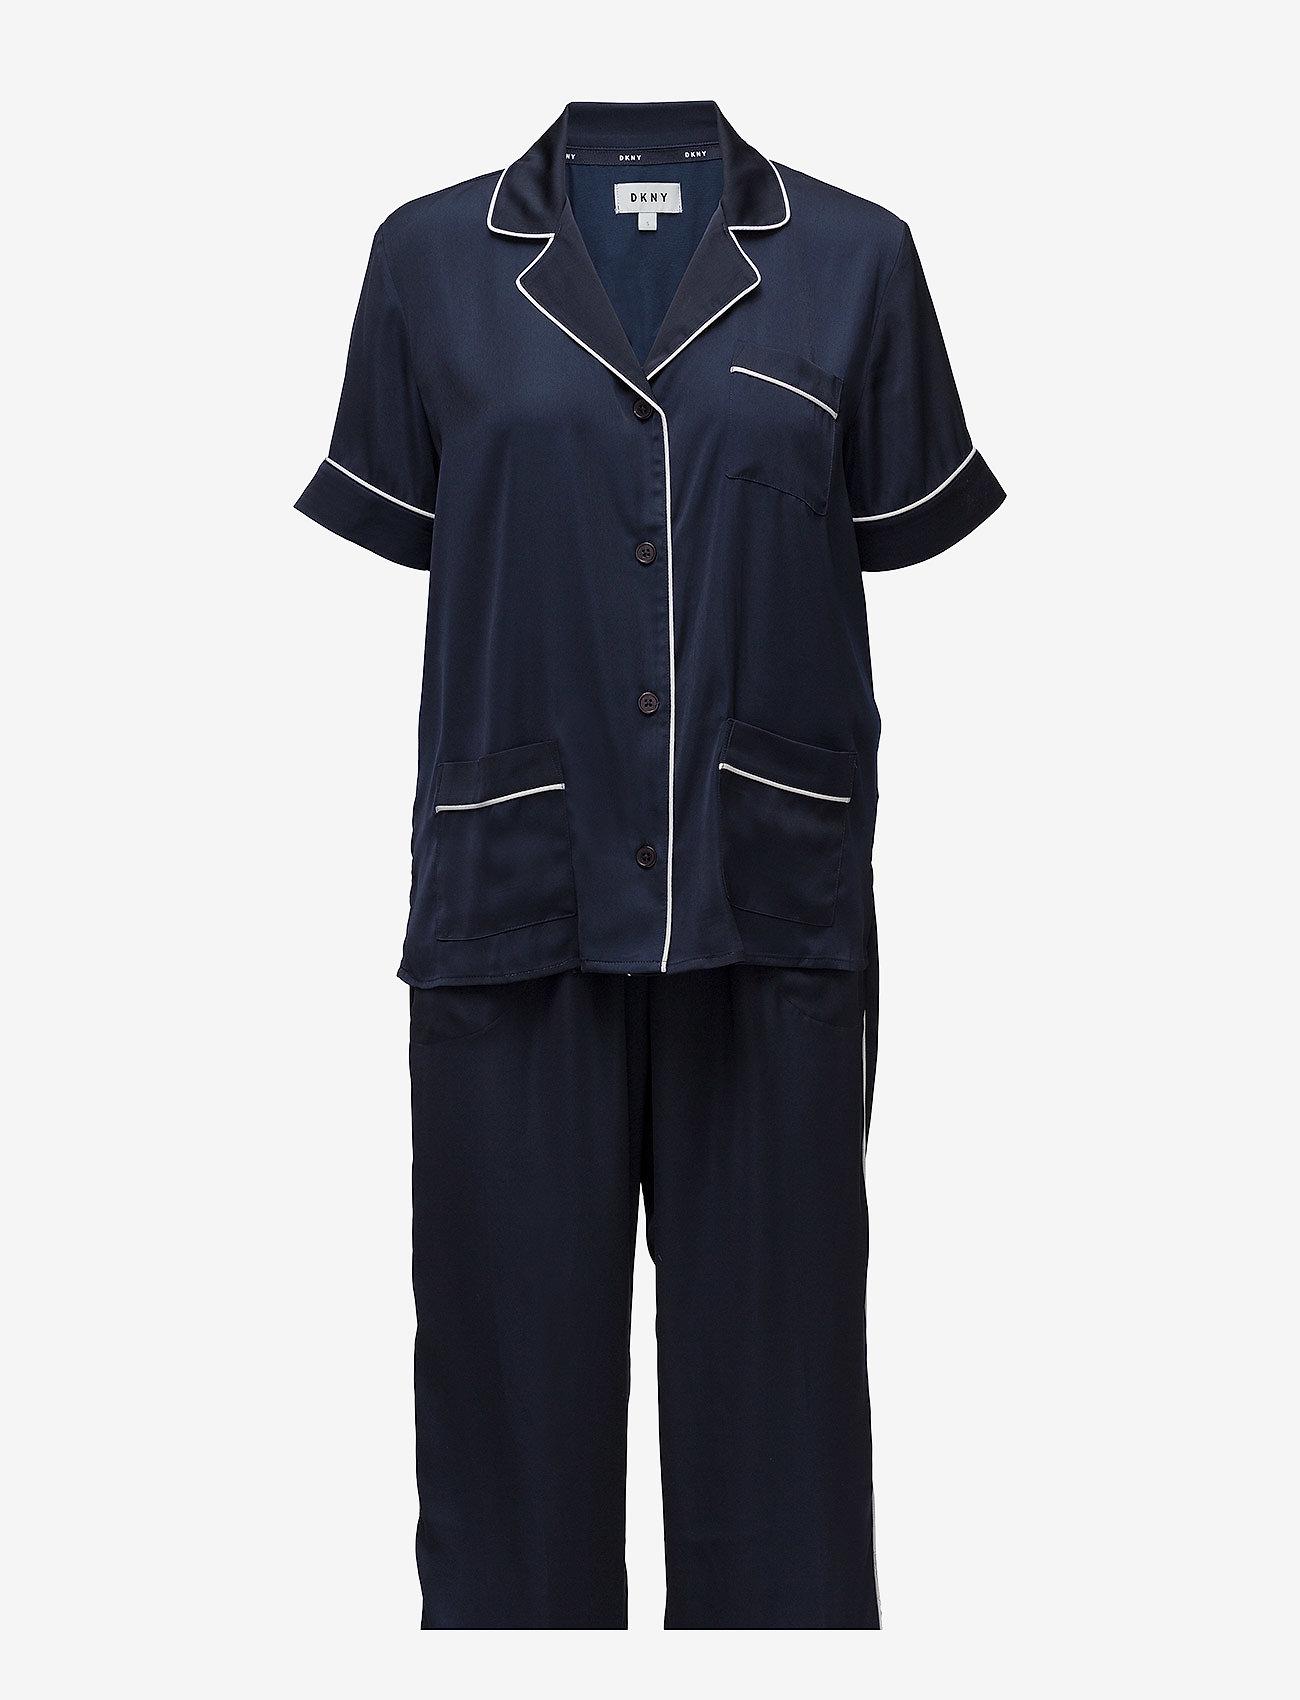 DKNY Homewear - DKNY WALK THE LINE TOP & CROP PANT - pyjamas - navy